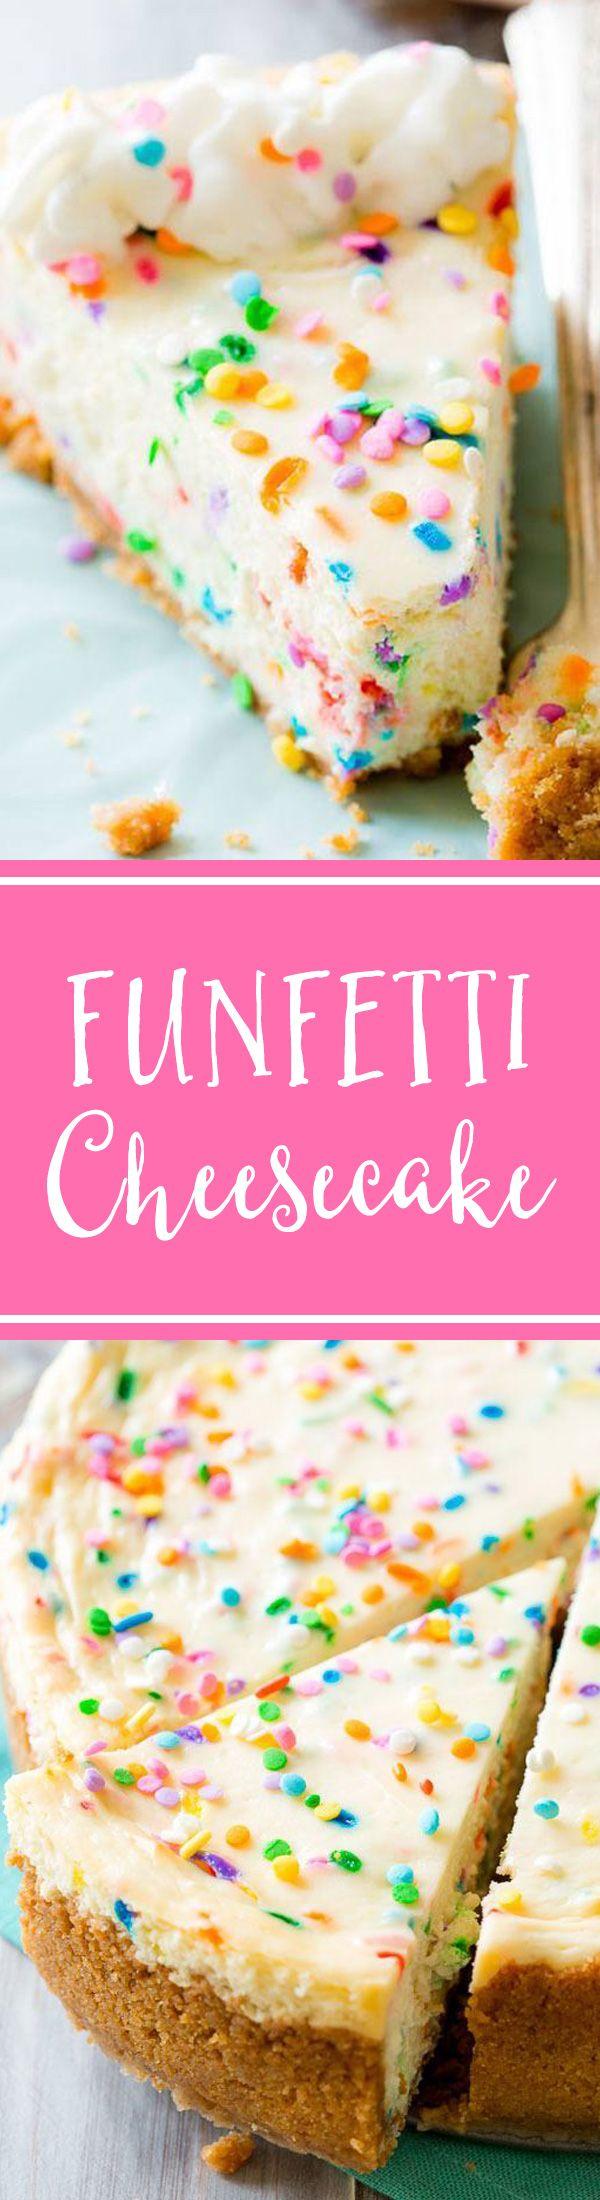 Funfetti Cheesecake on sallysbakingaddiction.com. Doesn't get much better than this!